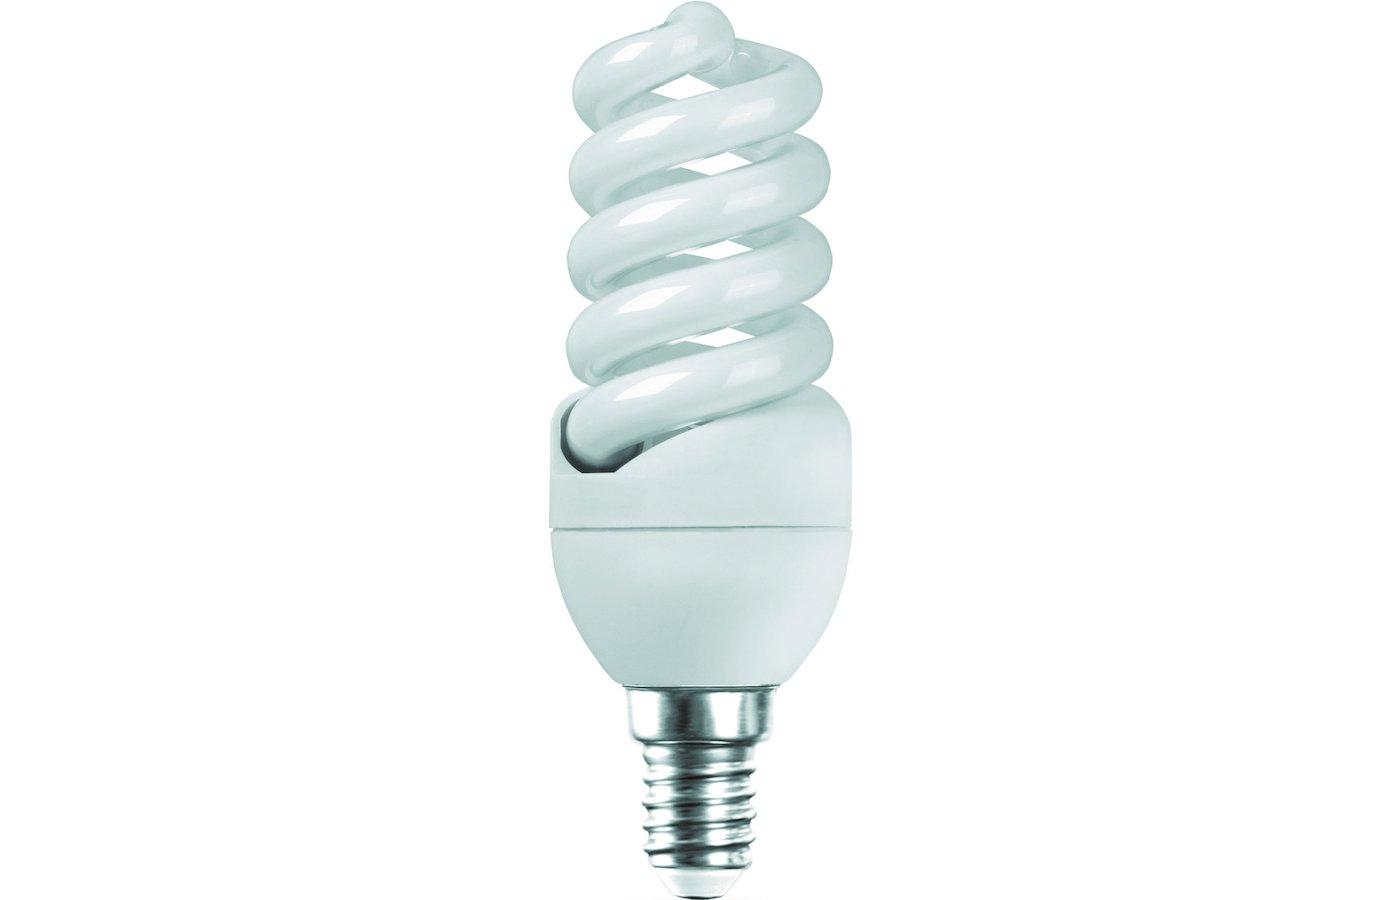 Лампочки энергосберегающие Camelion LH13-FS-T2-M/827/E14 (энергосбер.лампа 13Вт 220В)